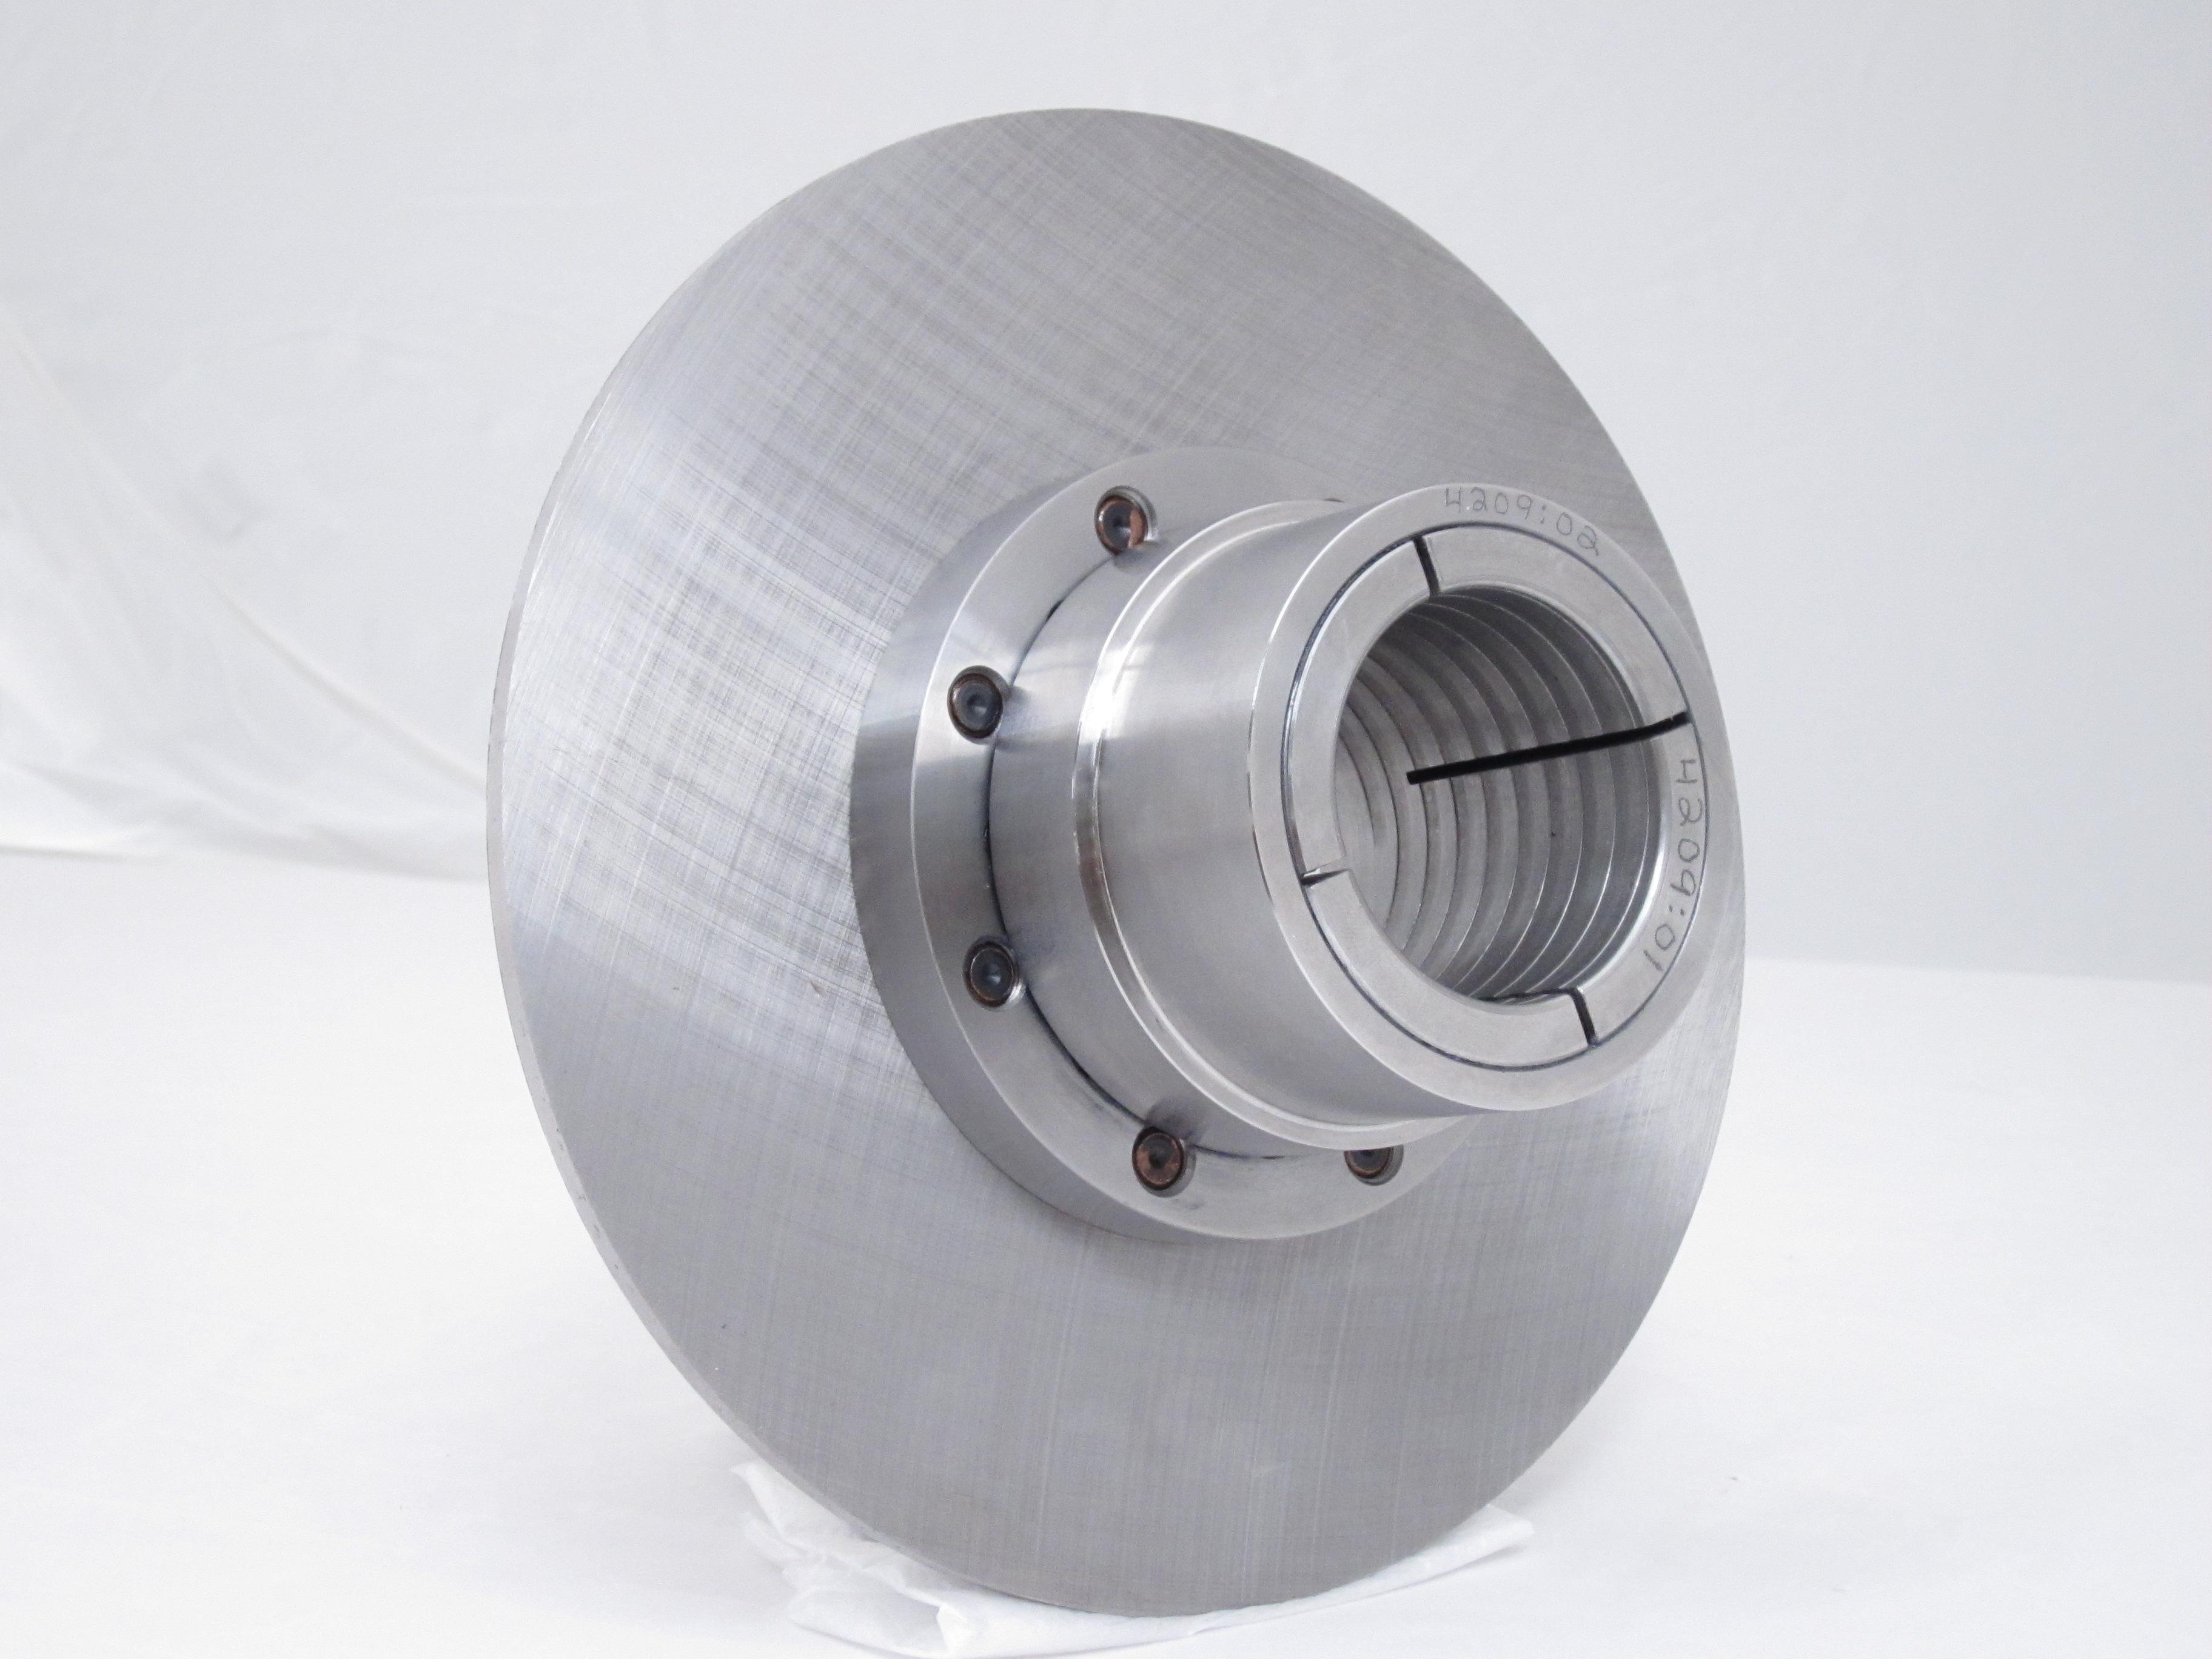 Clamp Hub with Brake Disc